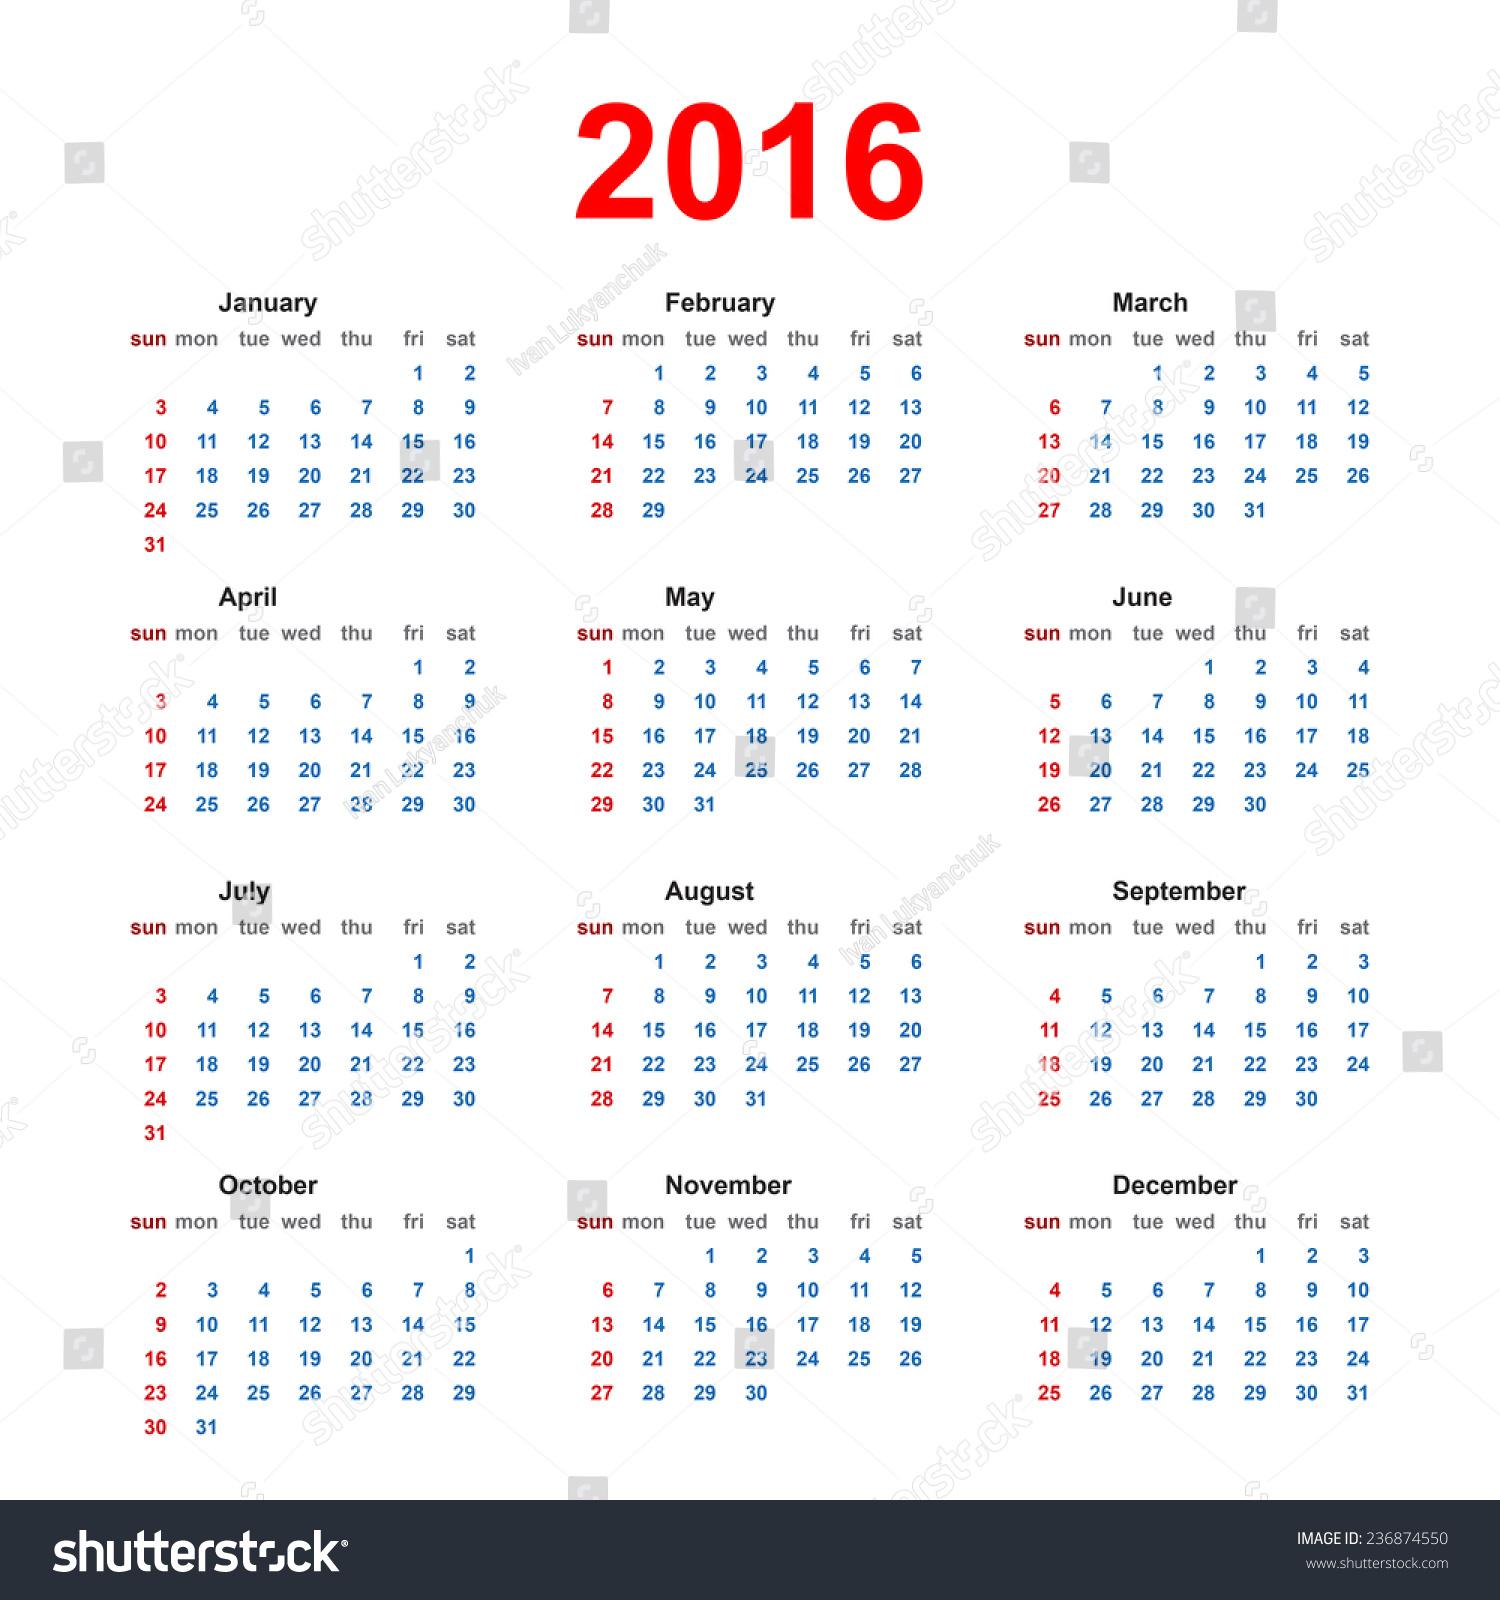 Holiday Calendar Design : Simple usa canadian year blank calendar with holiday